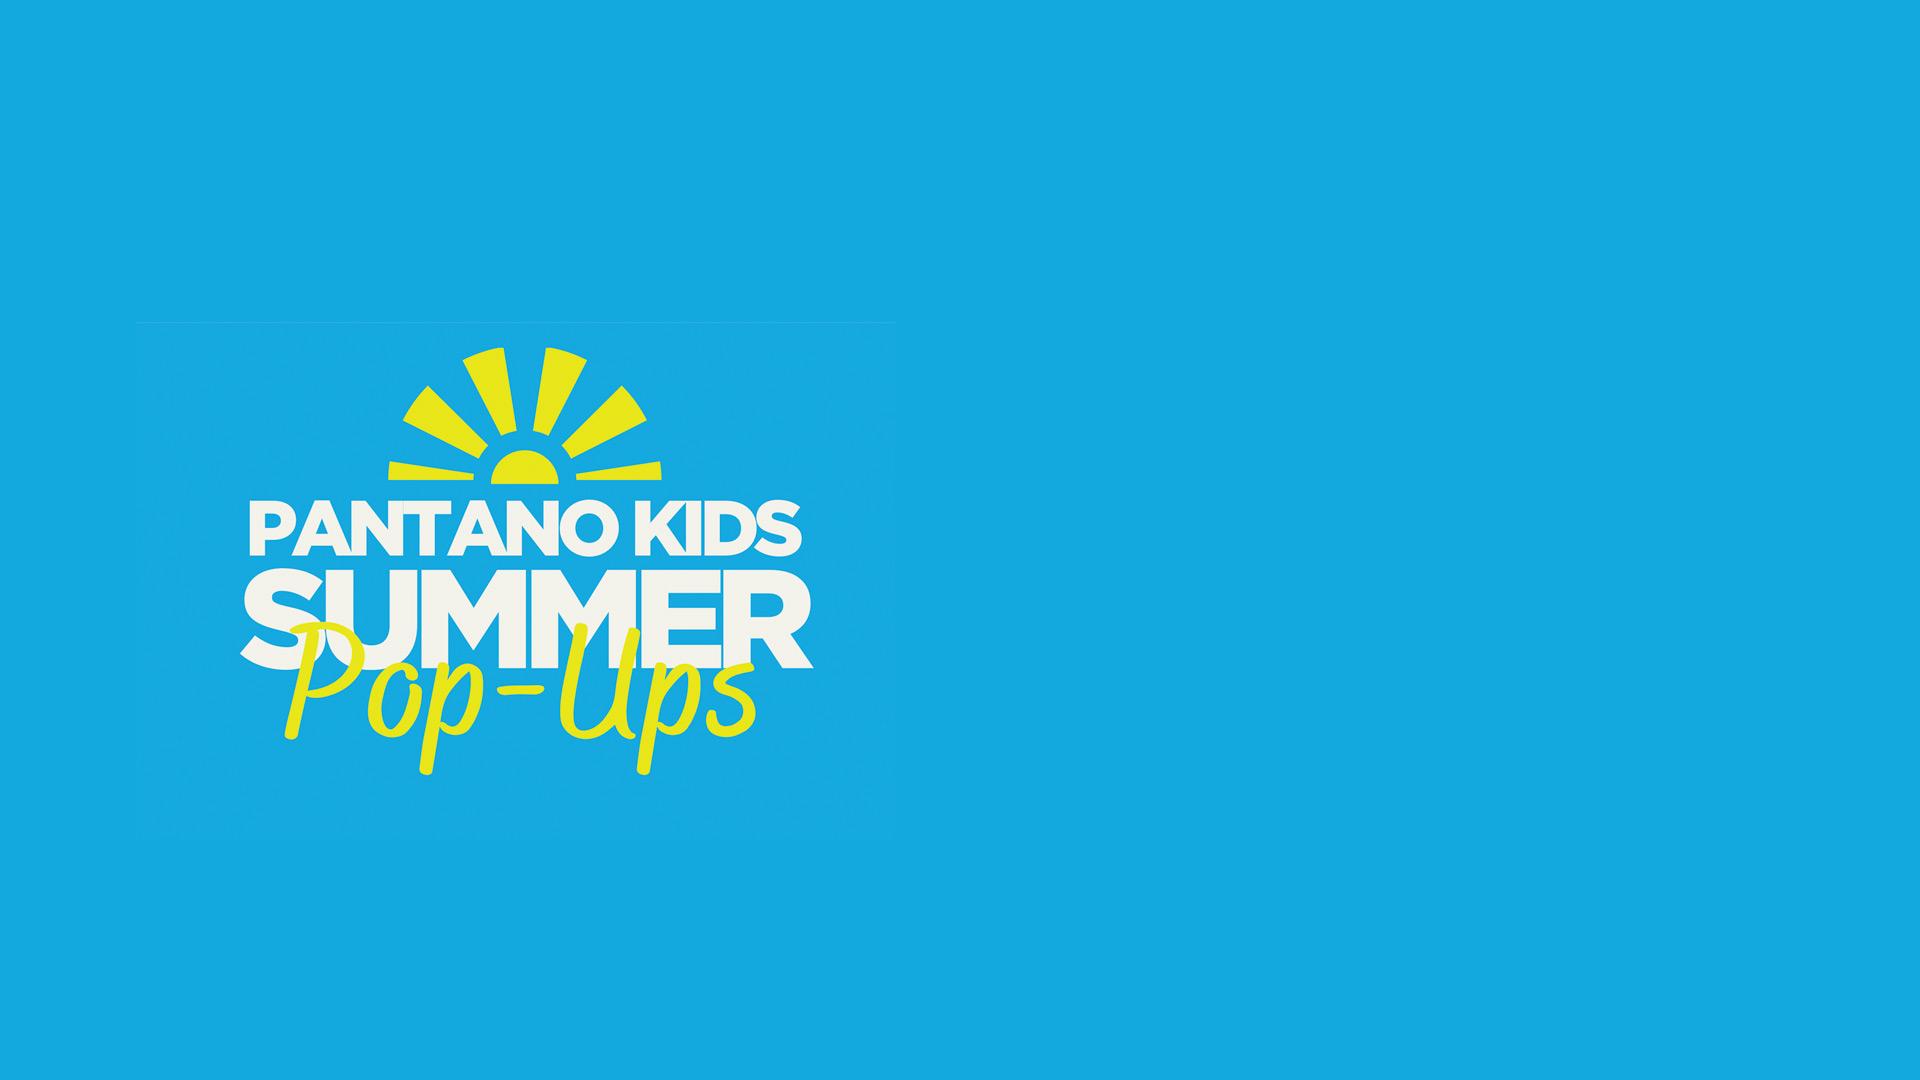 Image: Kids Summer Pop-ups